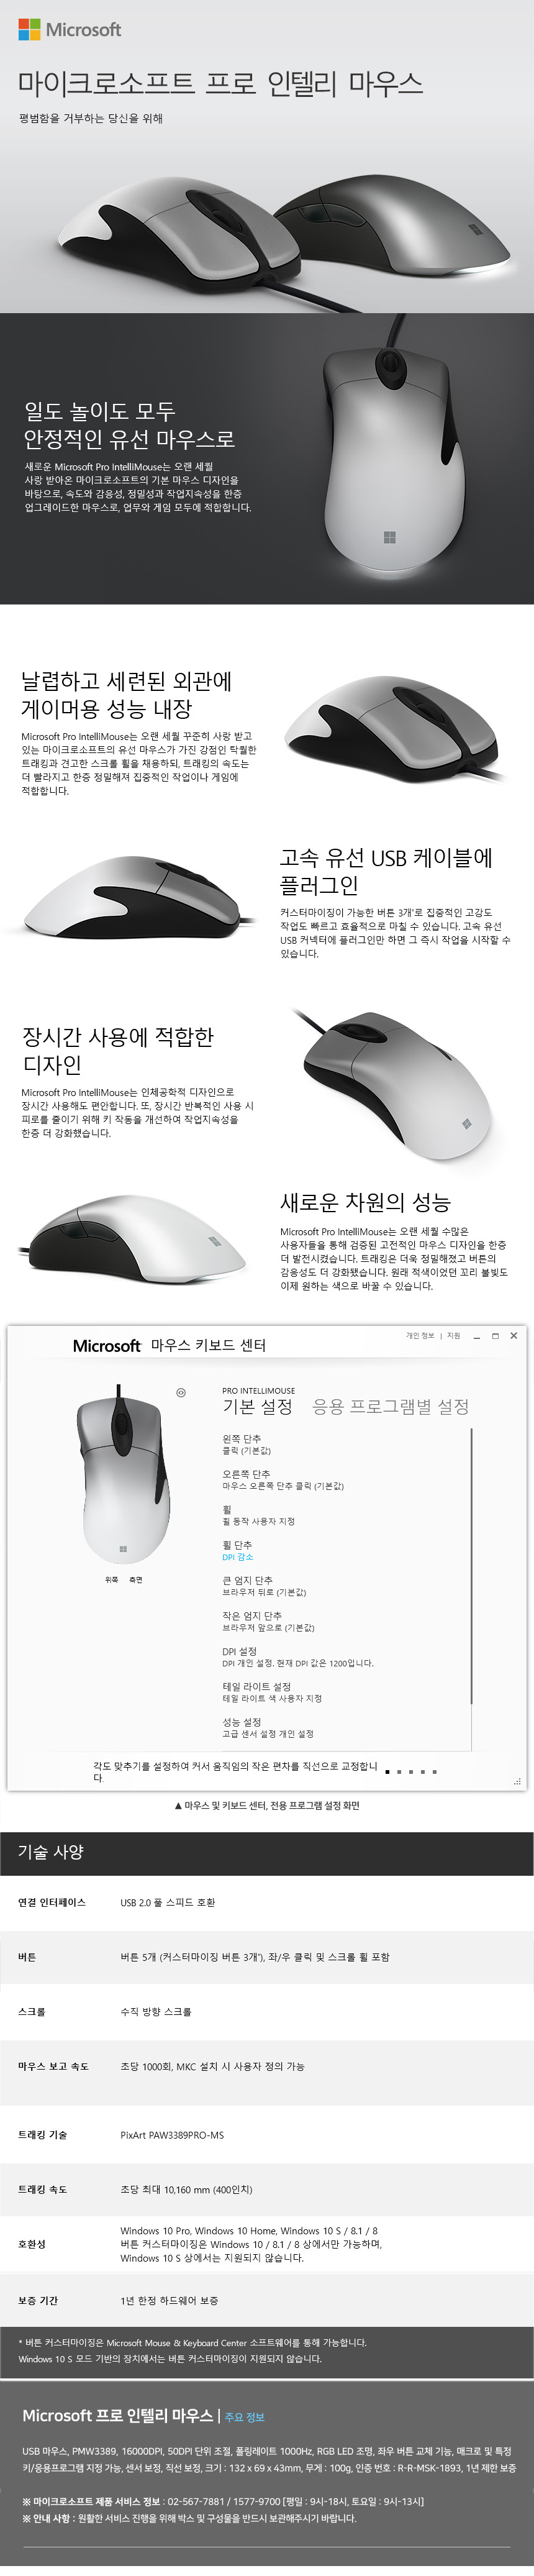 Microsoft  Pro IntelliMouse(정품, 쉐도우 블랙)